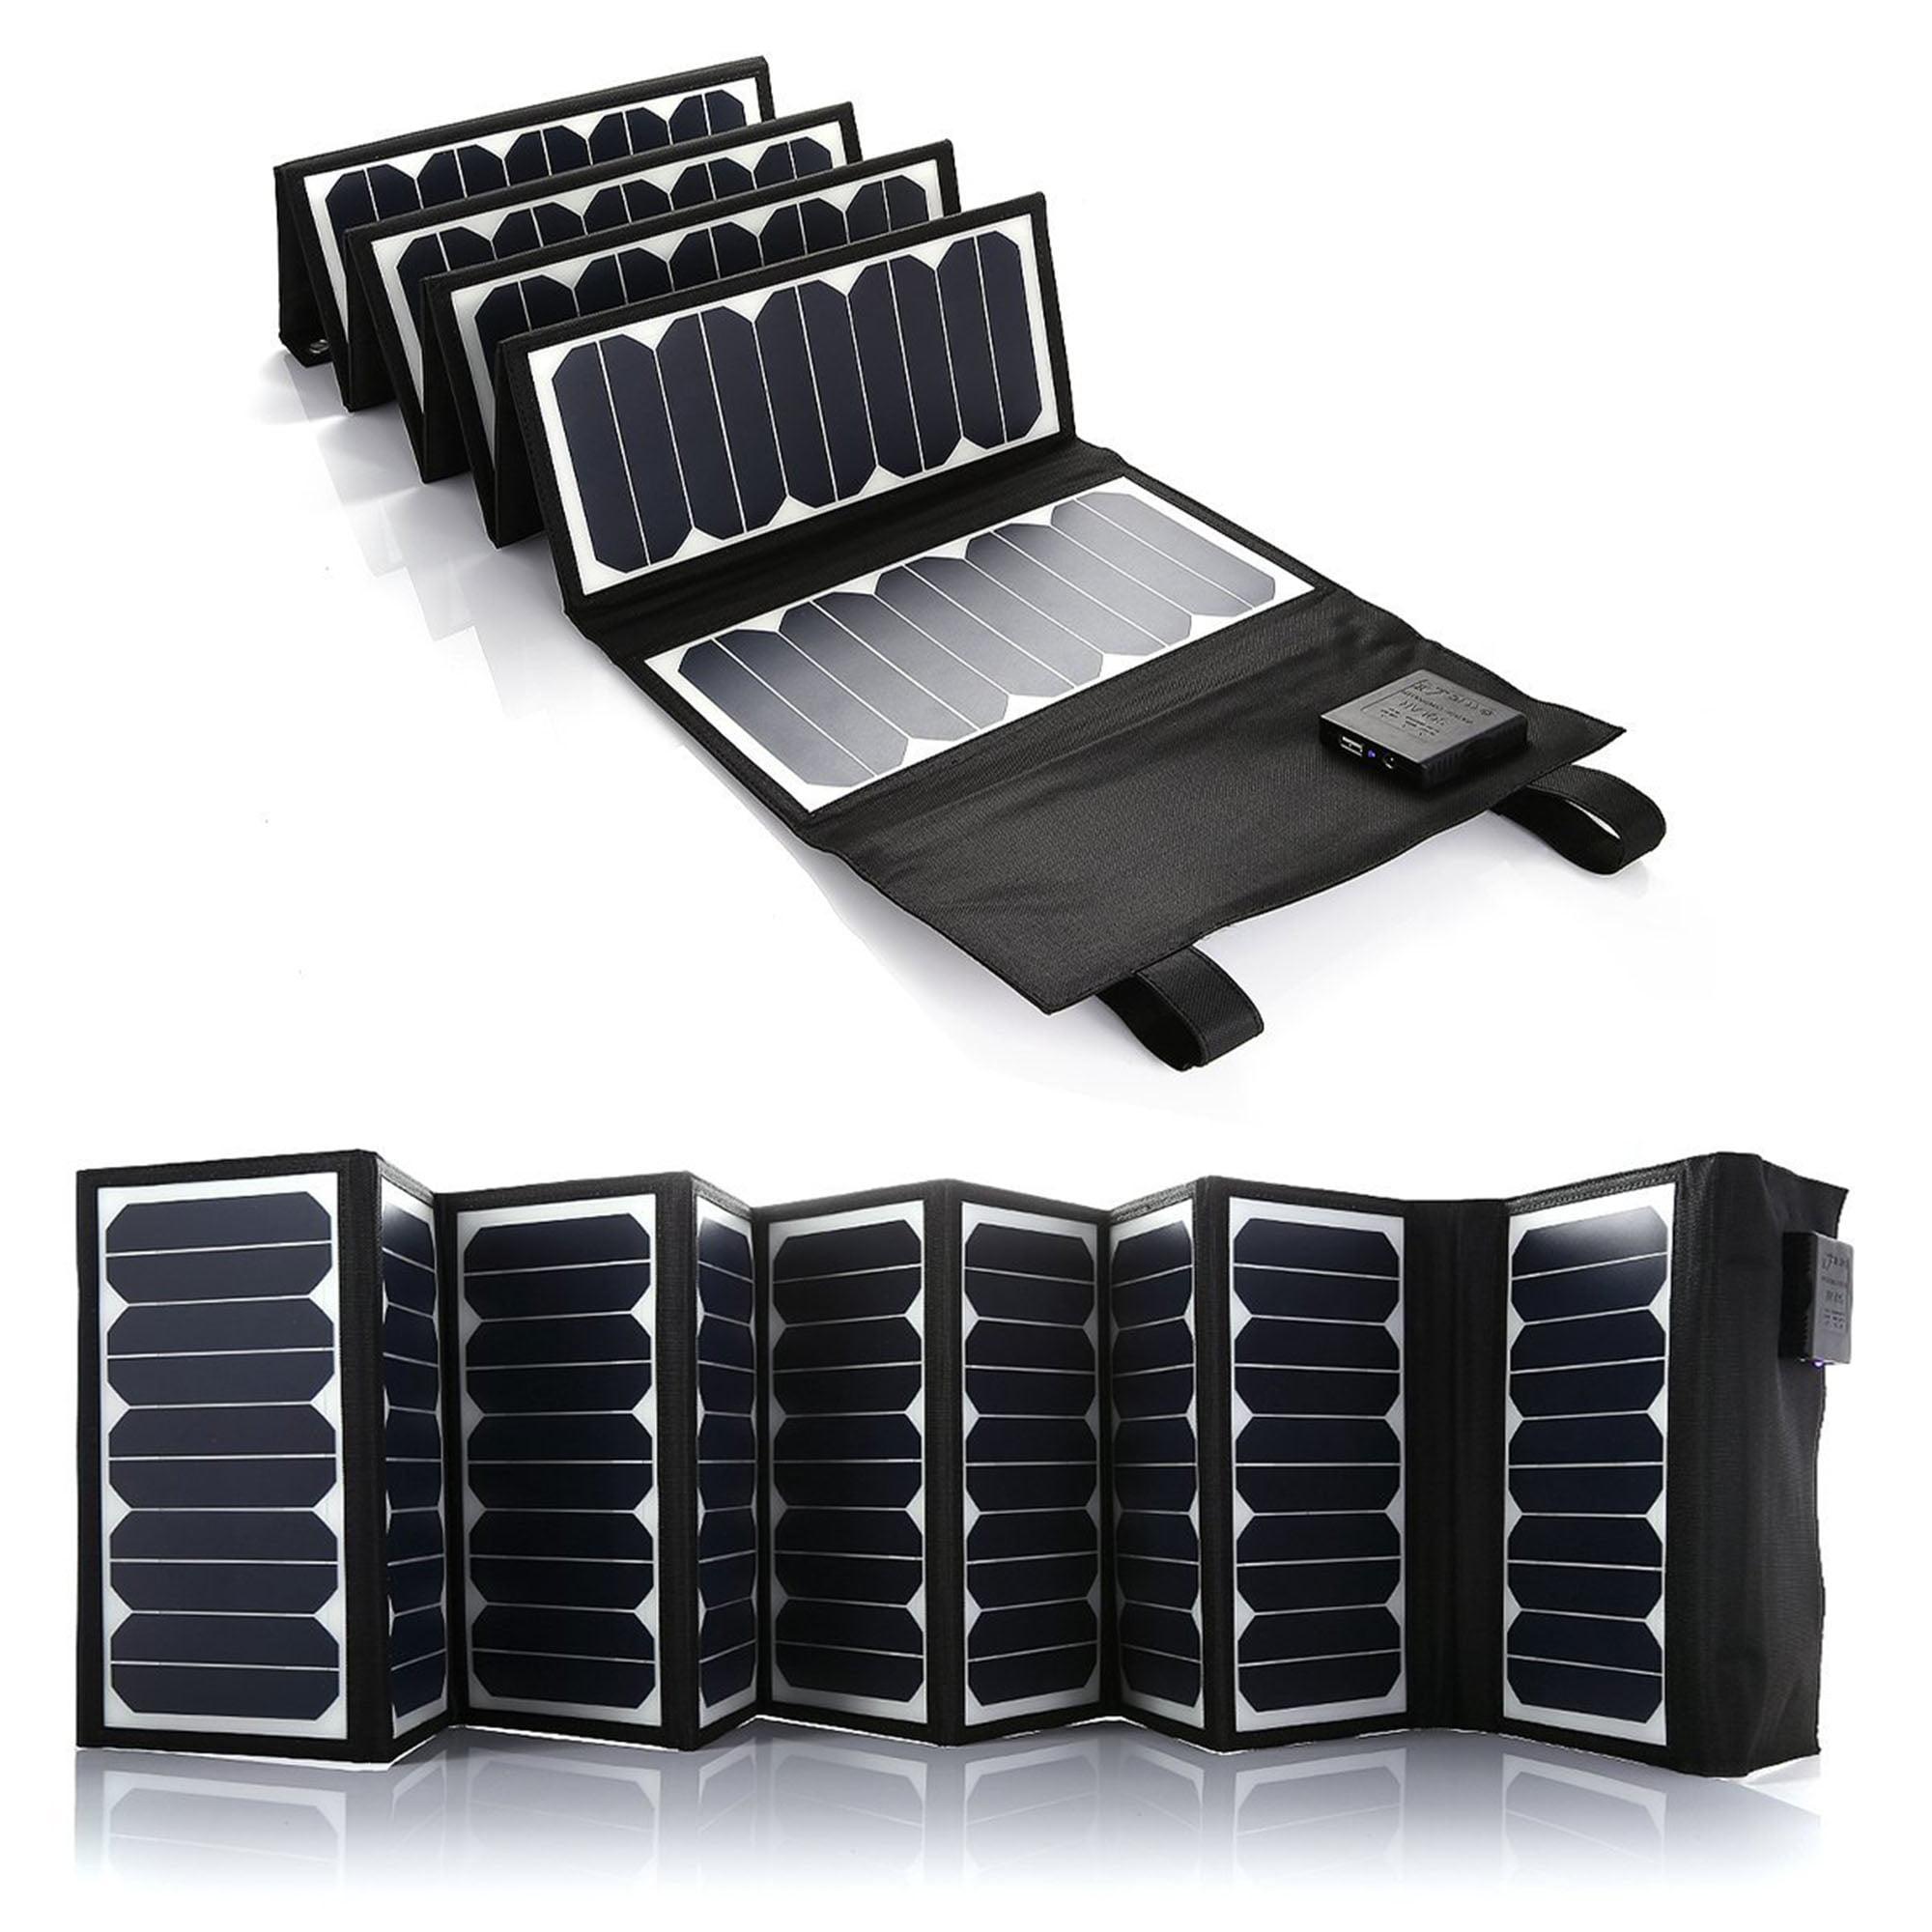 Poweradd 60W Solar Charger (5V USB + 18V DC) Portable Fol...